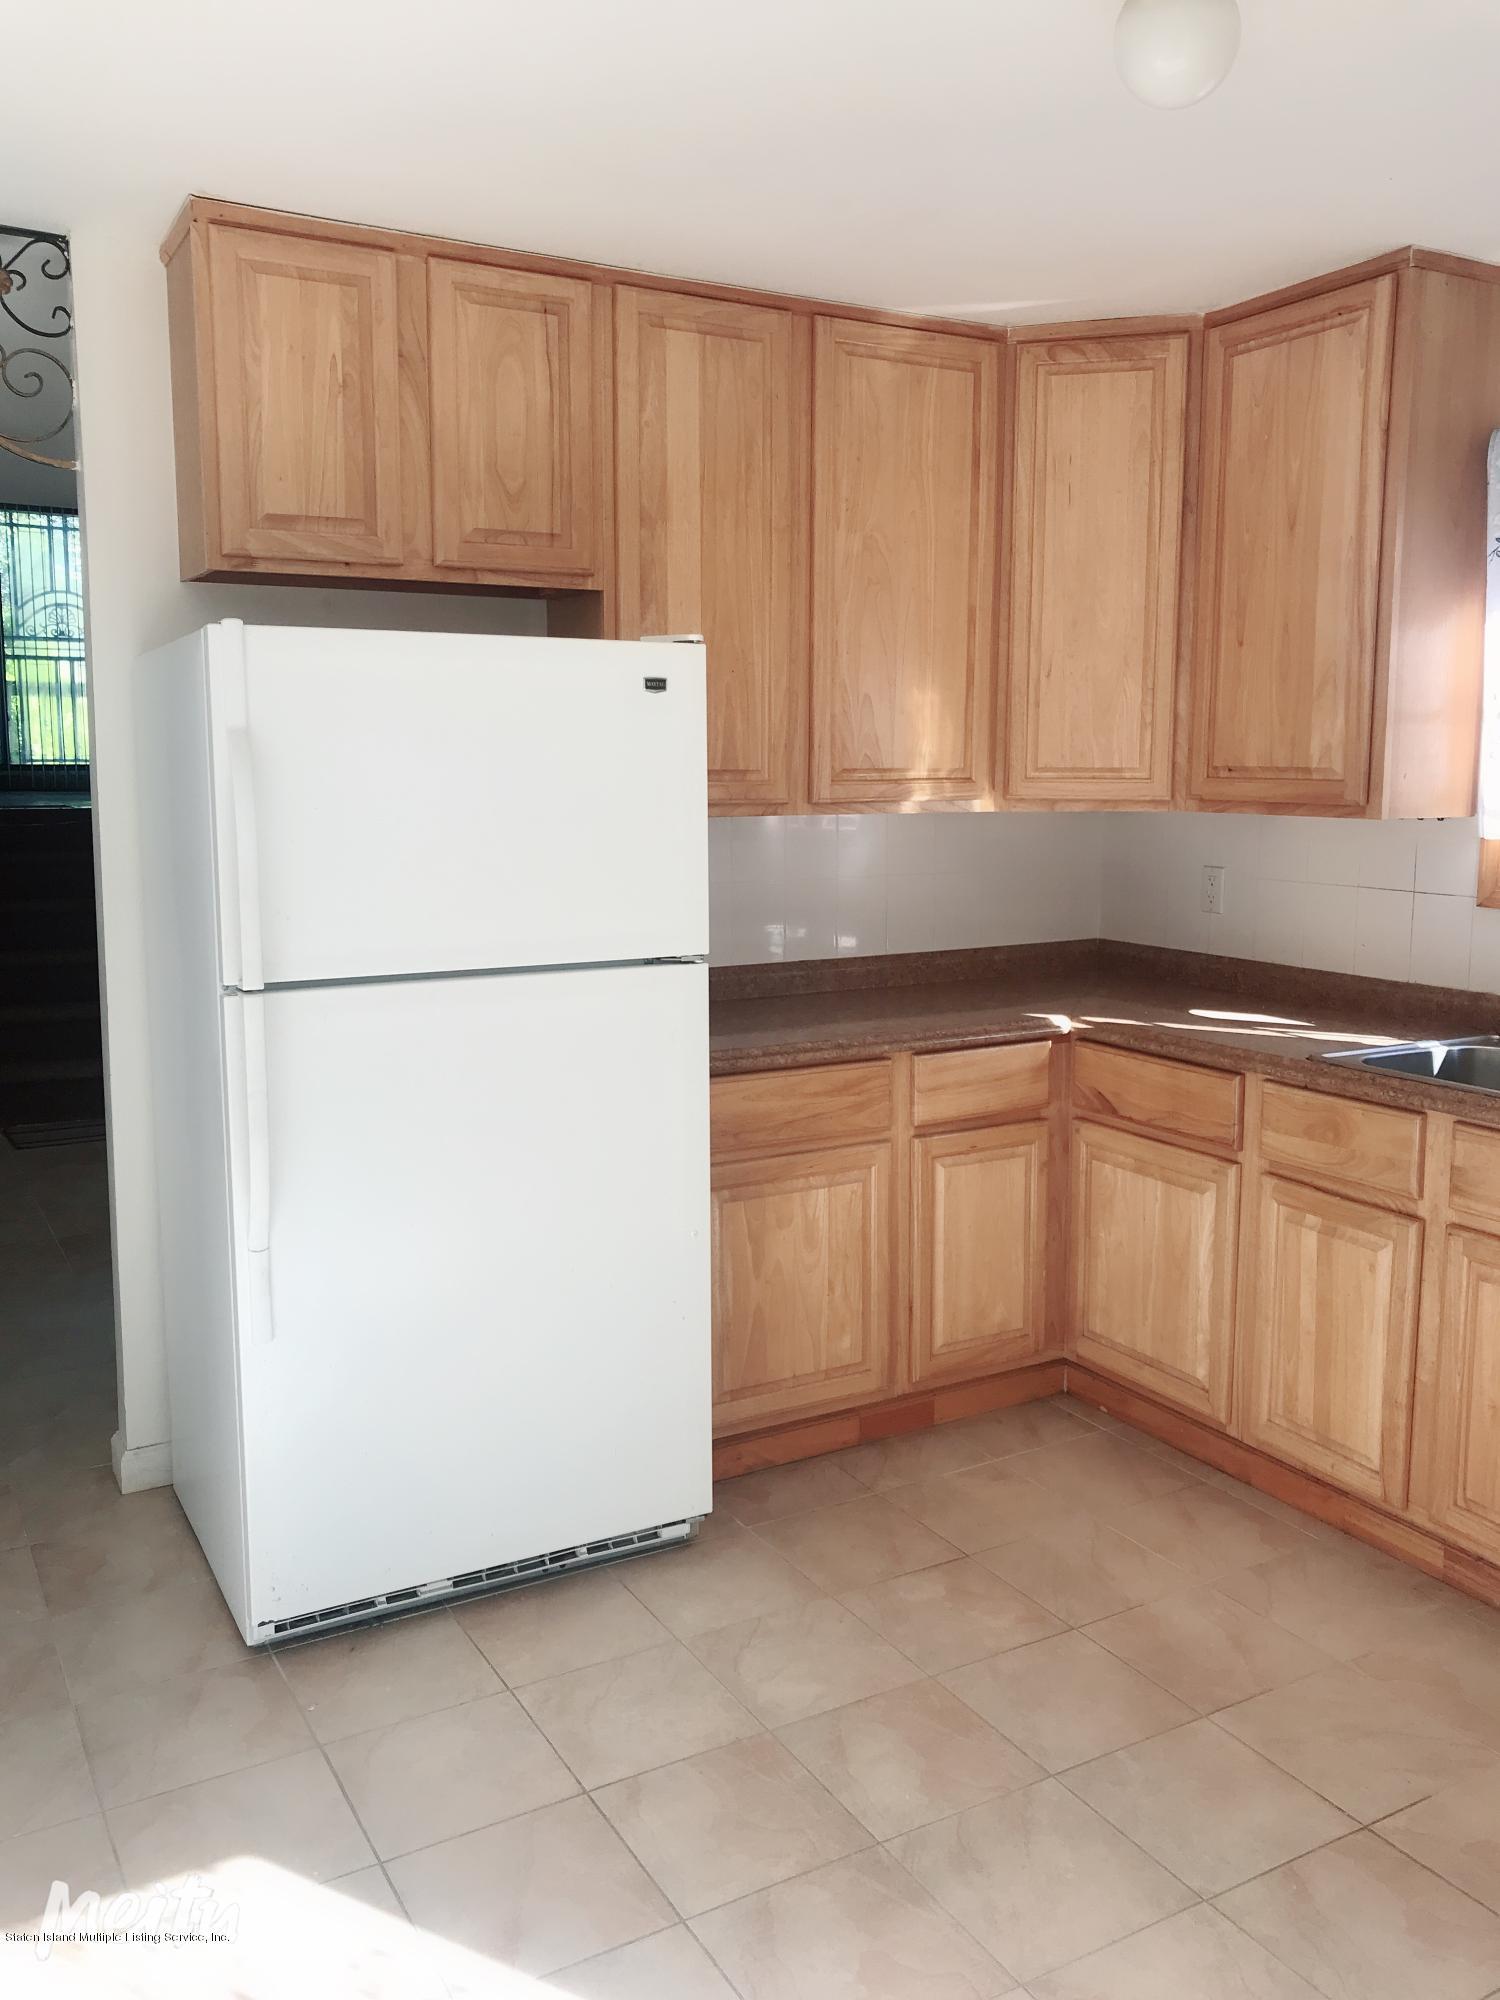 Single Family - Semi-Attached 129 Moreland Street  Staten Island, NY 10306, MLS-1129862-3